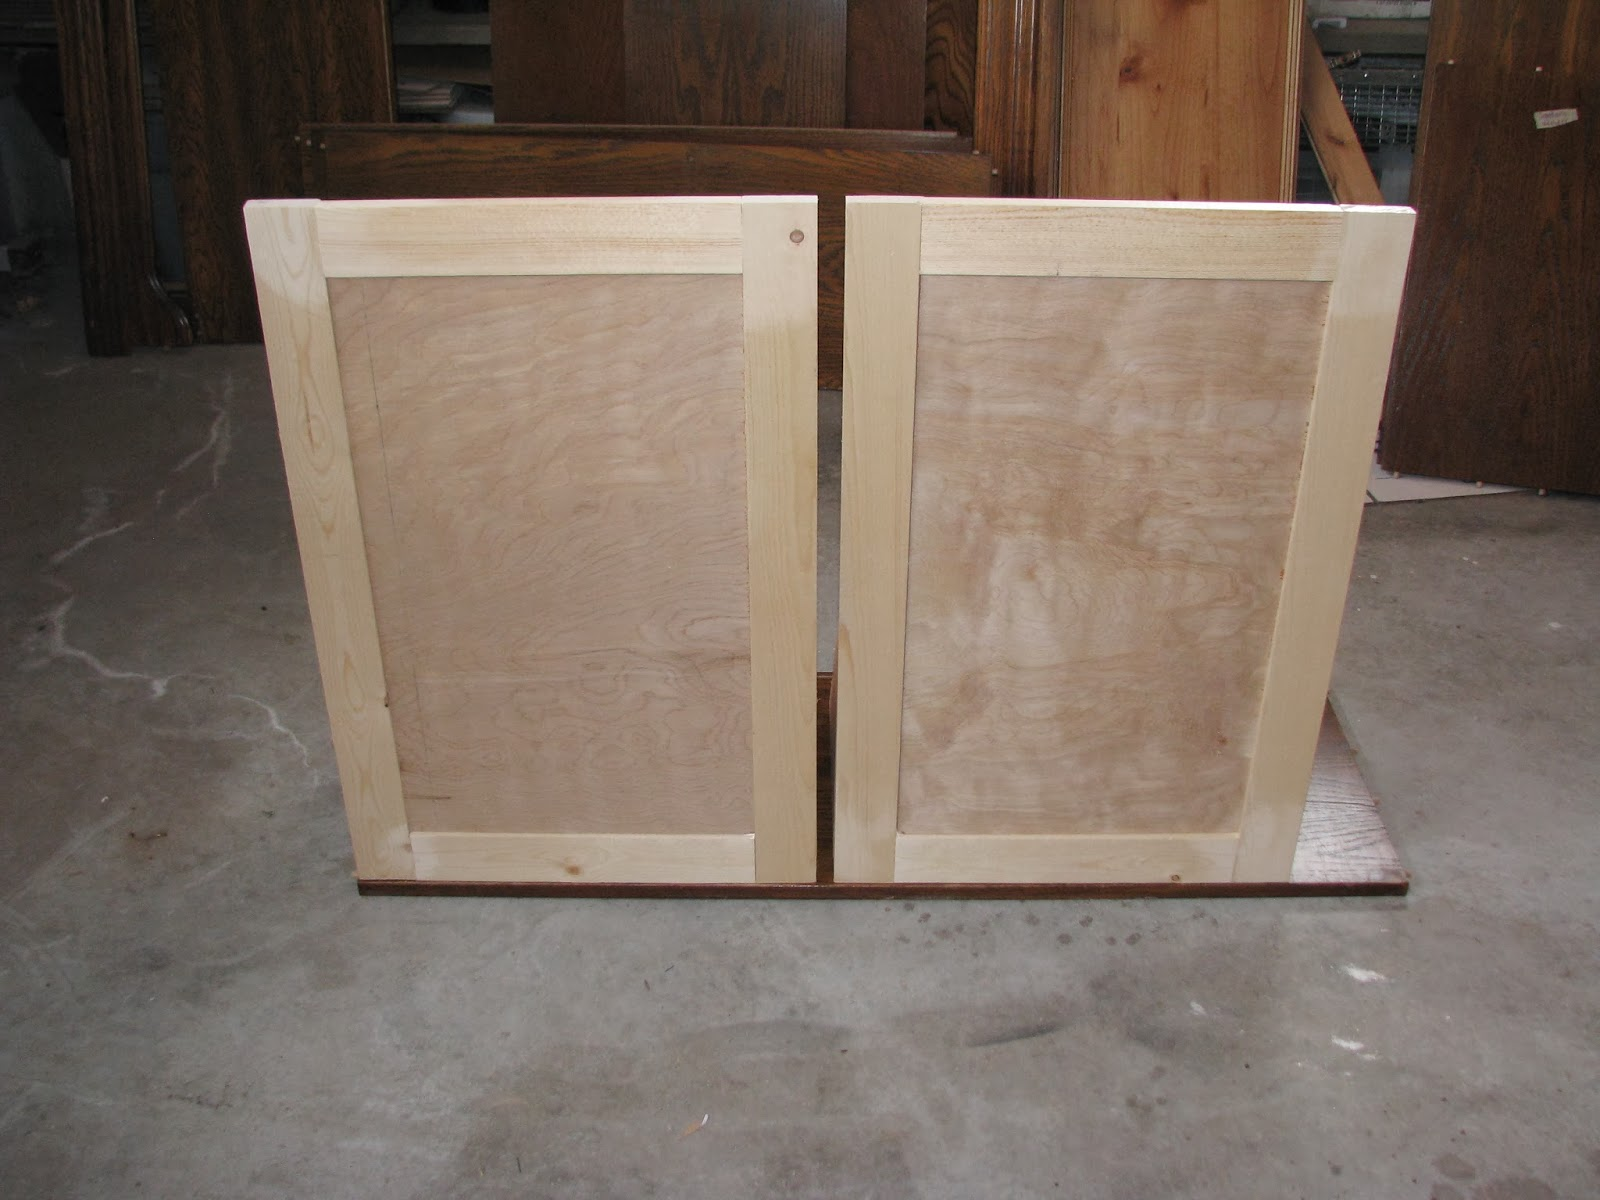 How To Make Kitchen Cabinet Doors Ninja Mega System Costco My So Called Diy Blog Making Using A Kreg Jig